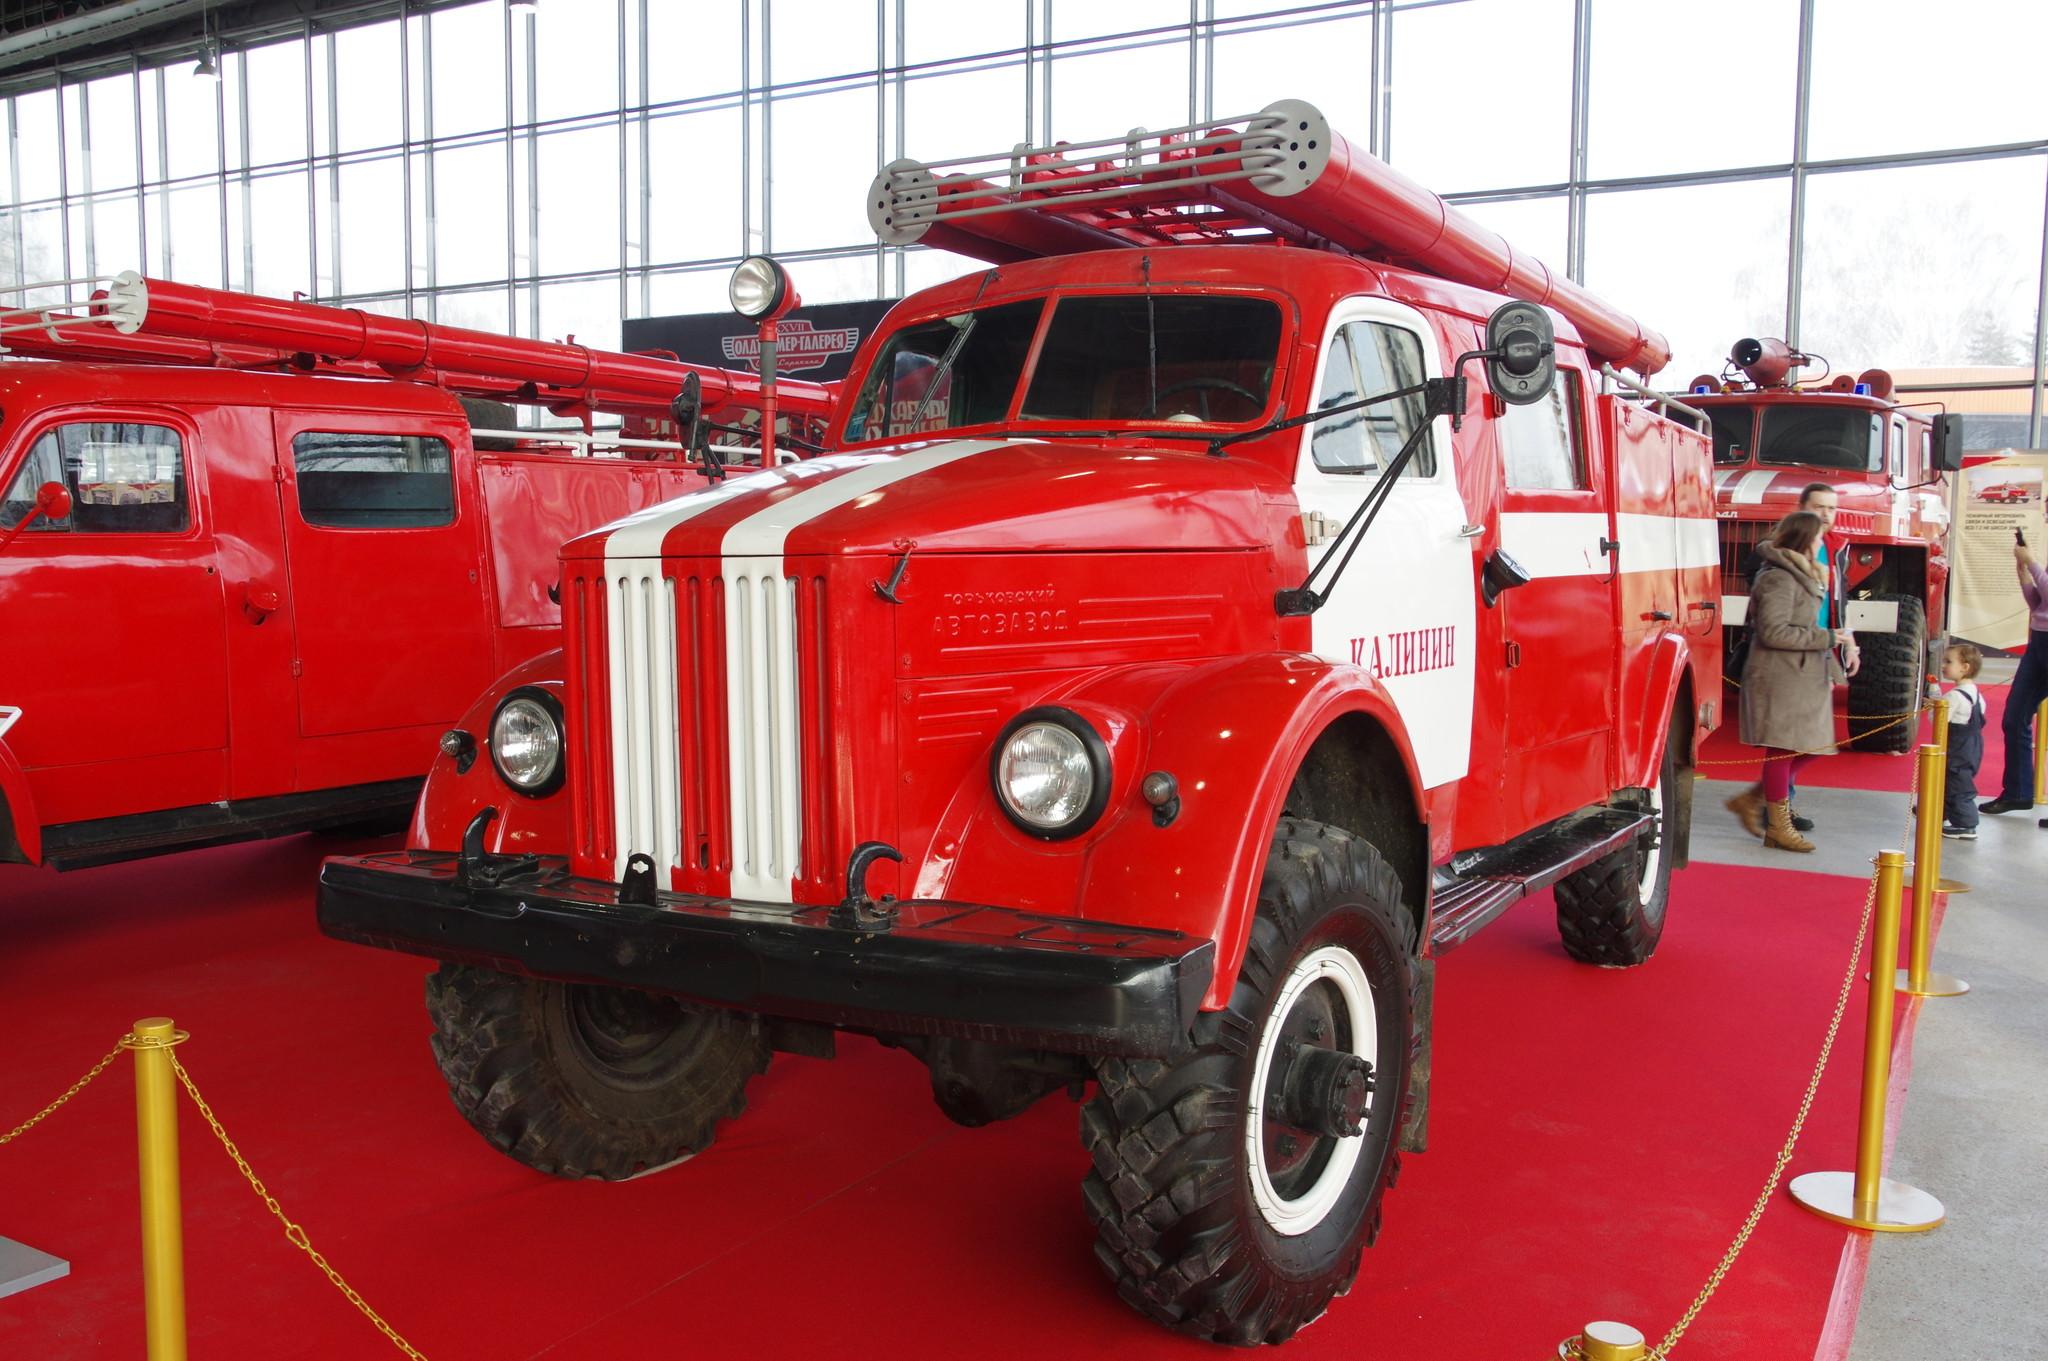 Пожарная автоцистерна АЦП-20(63)19М